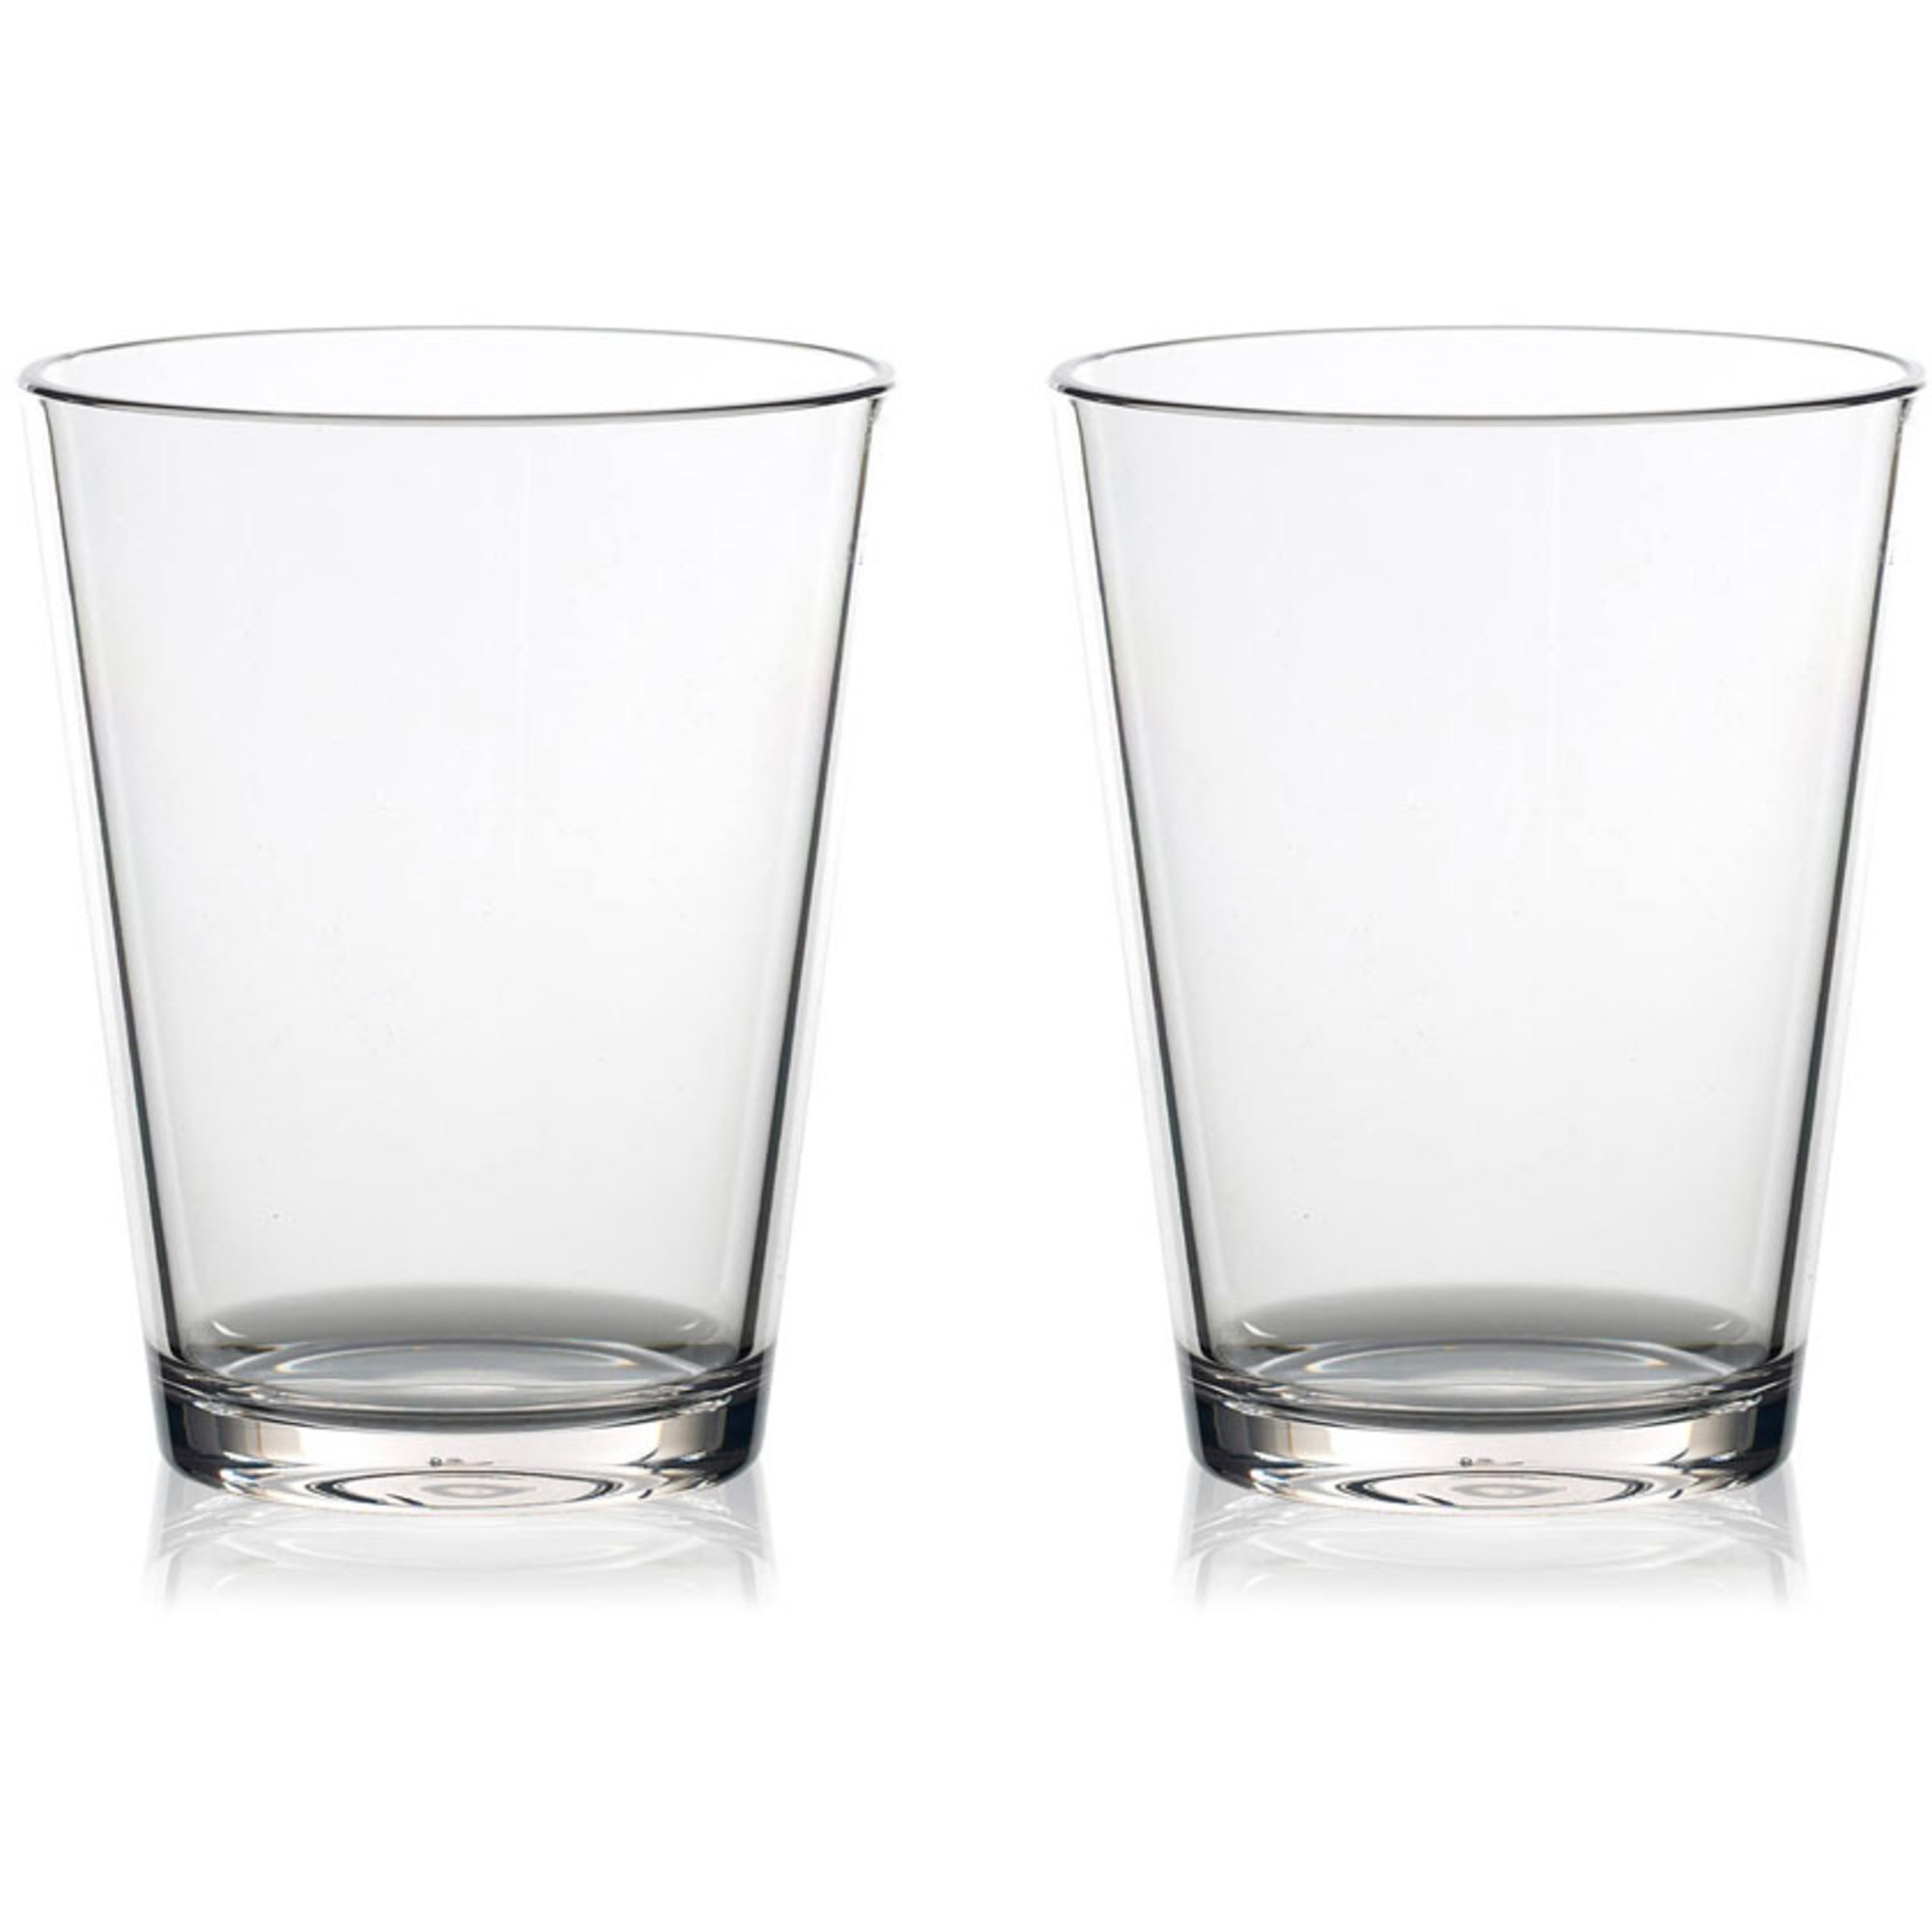 Rosti Mepal Vattenglas 200 ml 2-pack